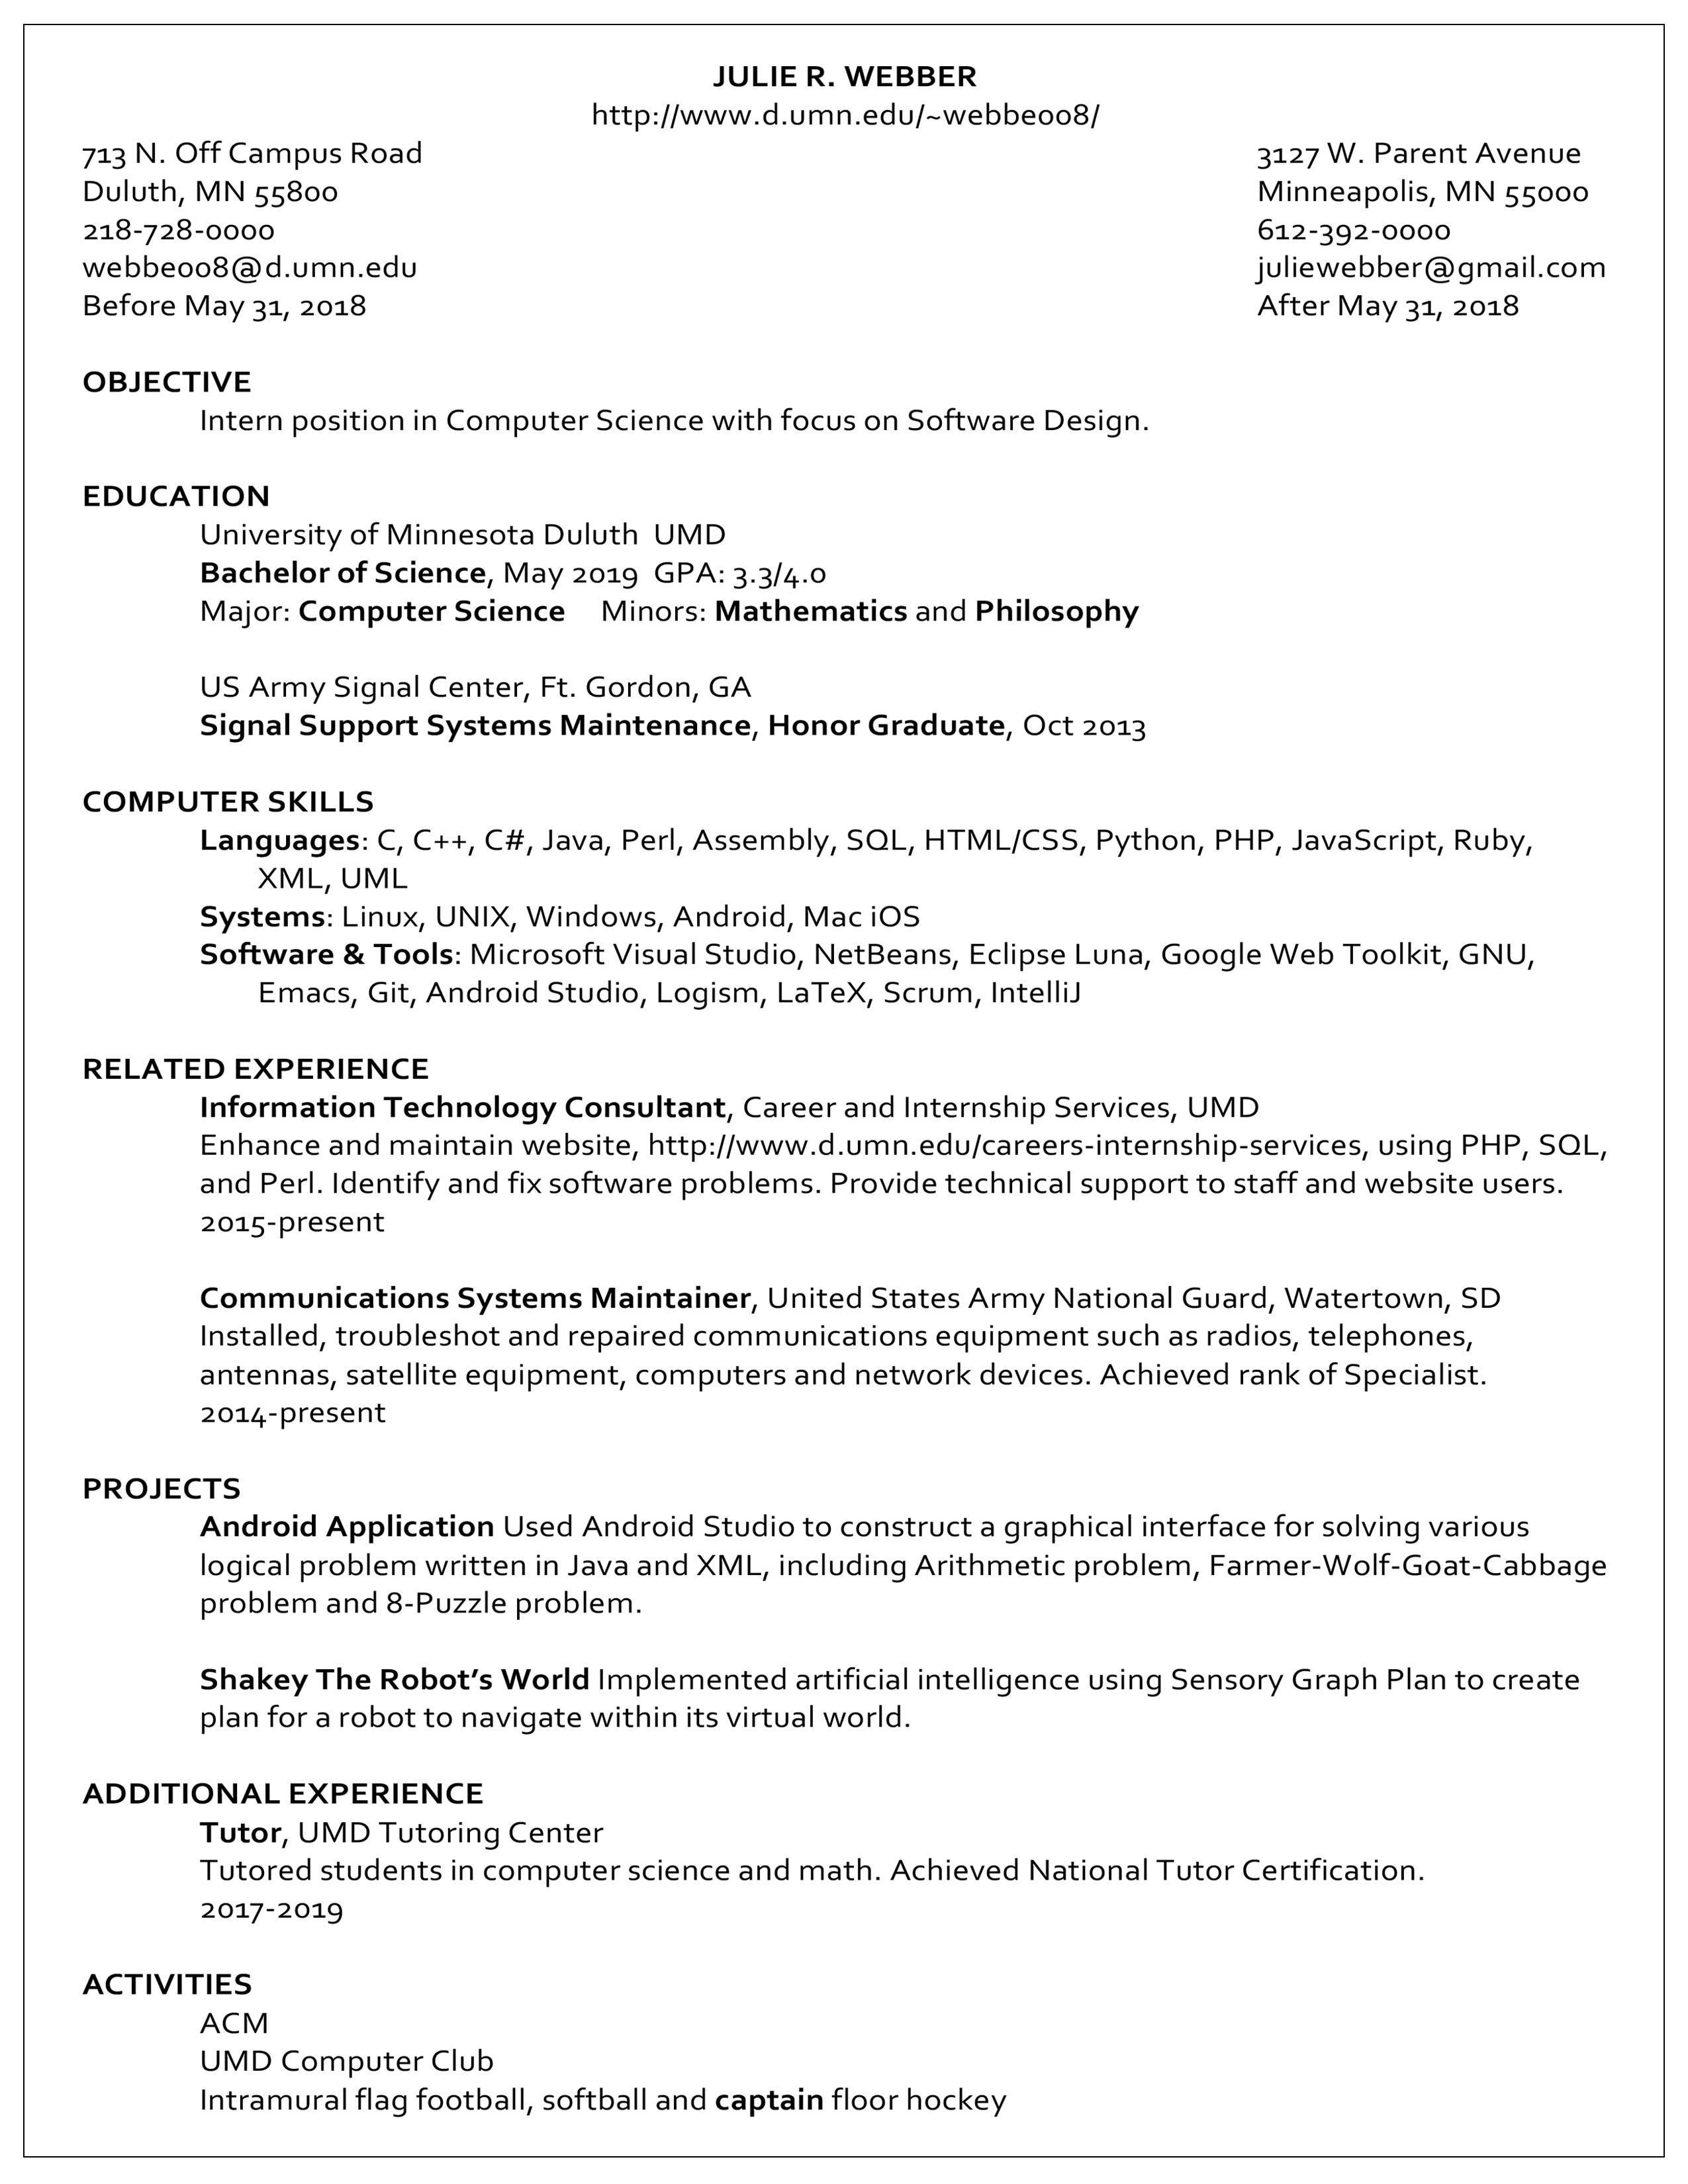 27 Resume Accounting Skills Job Resume Examples Professional Resume Examples Resume Examples